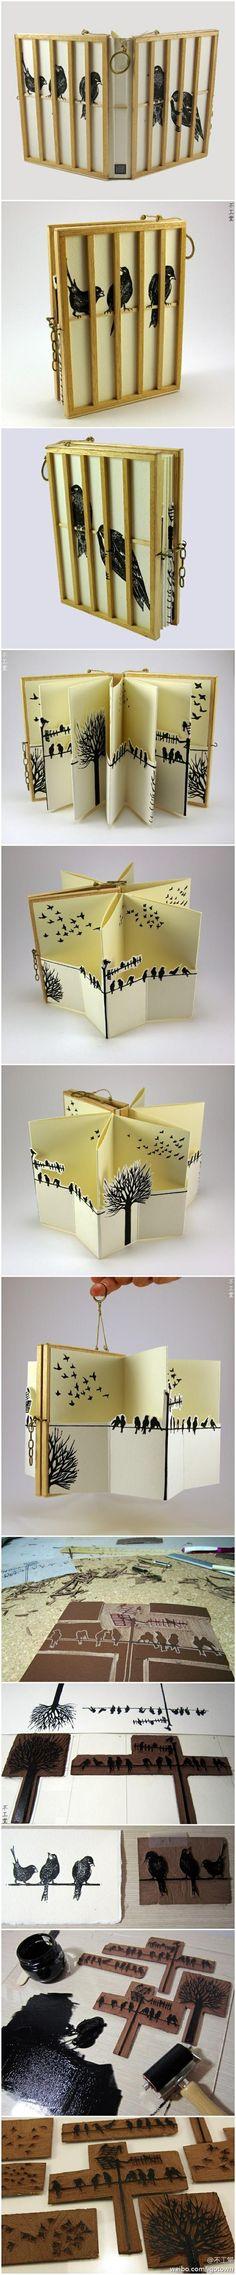 Artist book - Pop up book - Crows.